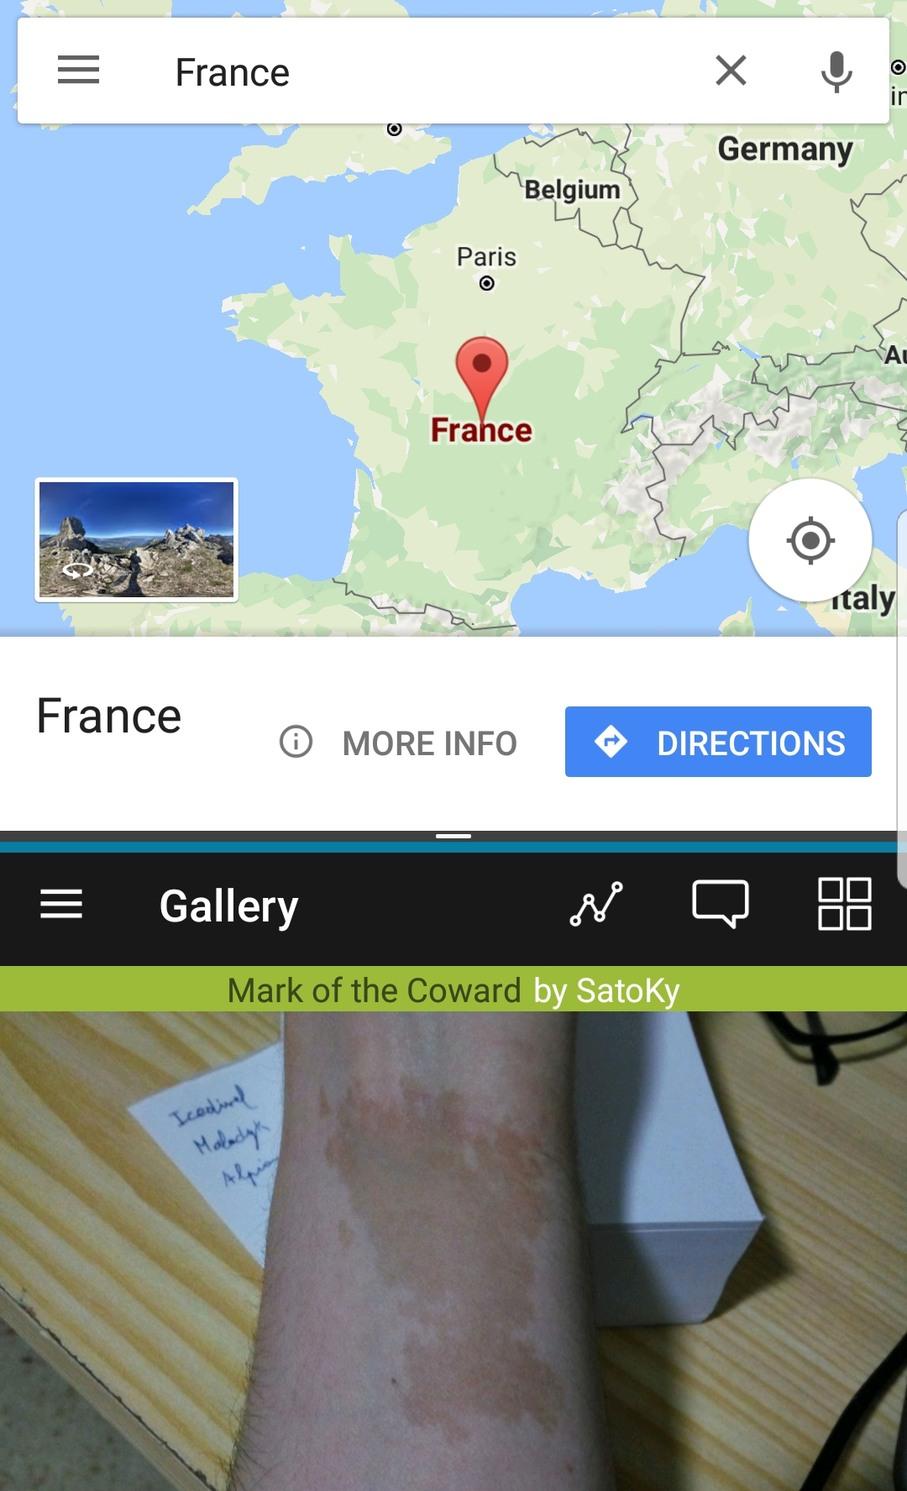 France Vs. Birthmark - meme